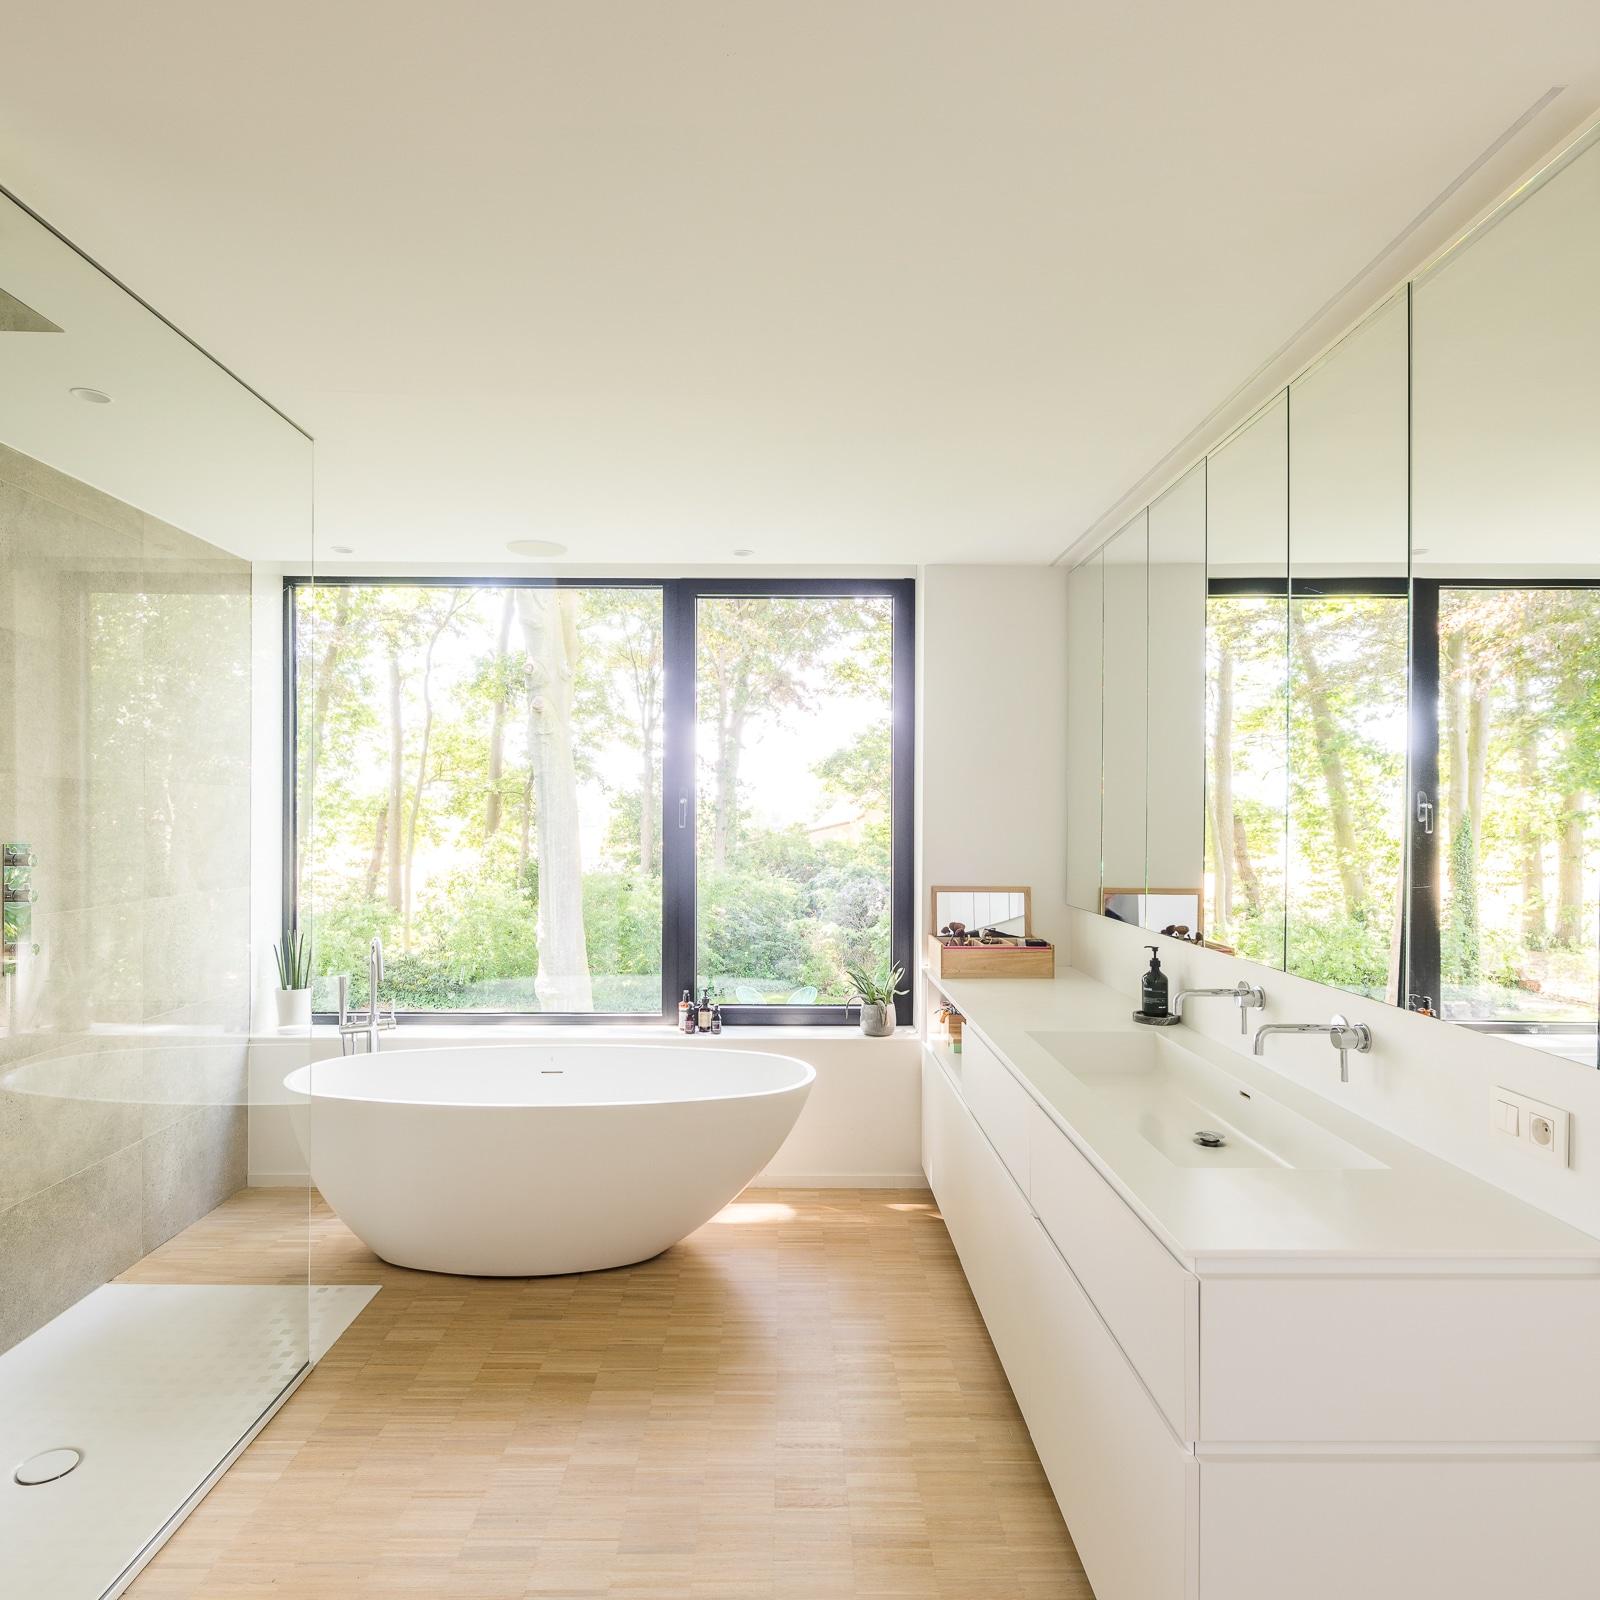 BaeyensBeck Kjell 057web | Baeyens & Beck architecten Gent | architect nieuwbouw renovatie interieur | high end | architectenbureau